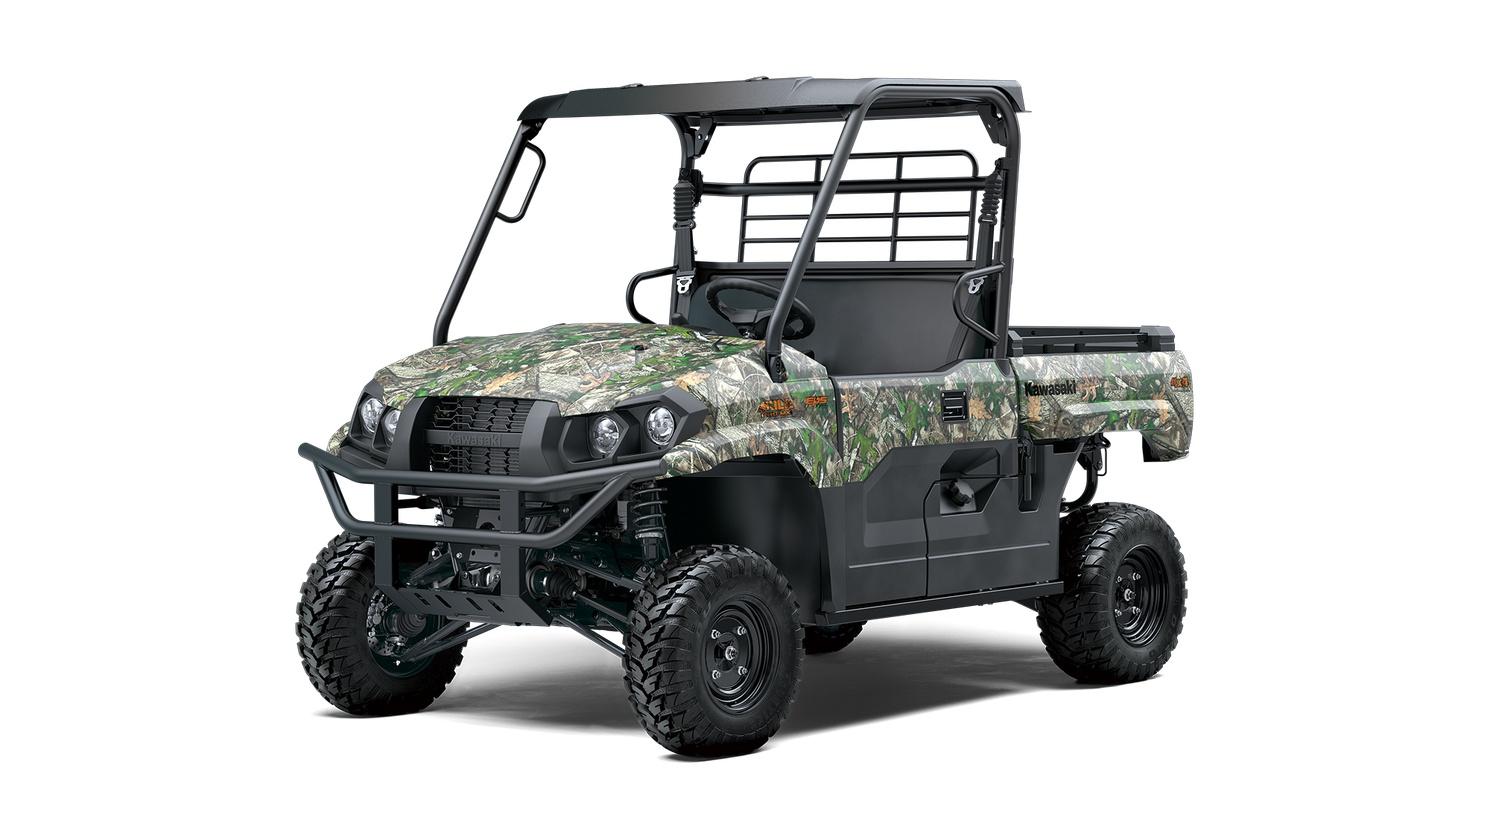 2020 Kawasaki MULE PRO-MX EPS CAMO Camouflage Truetimber Htc Green